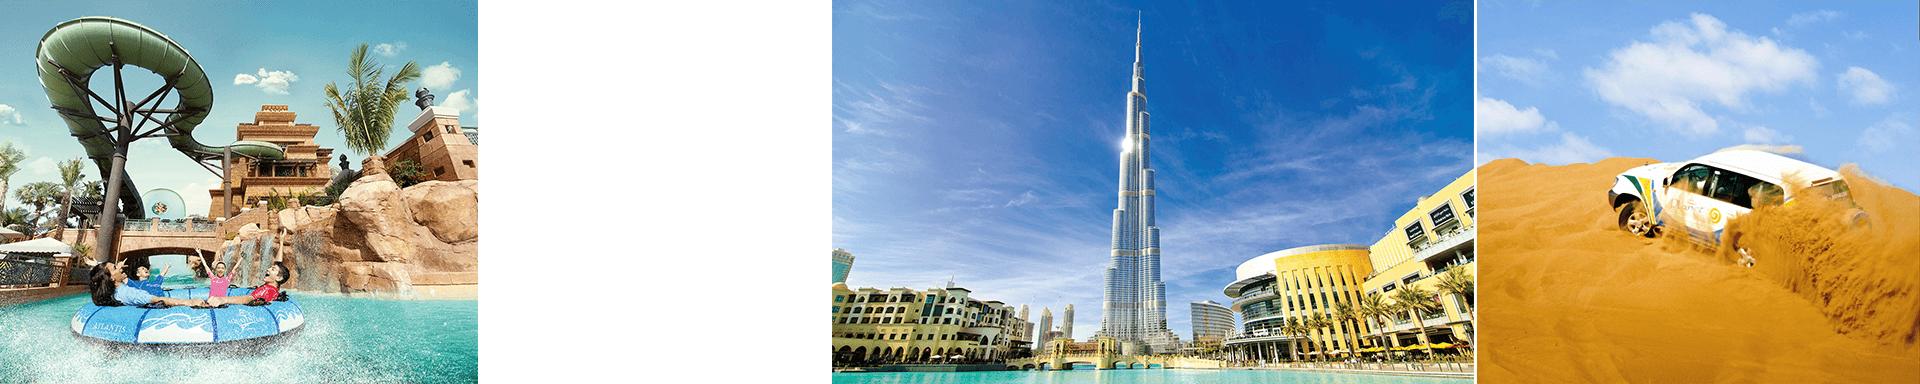 Save up to 10% on 2019 and 2020 Dubai Explorer Pass